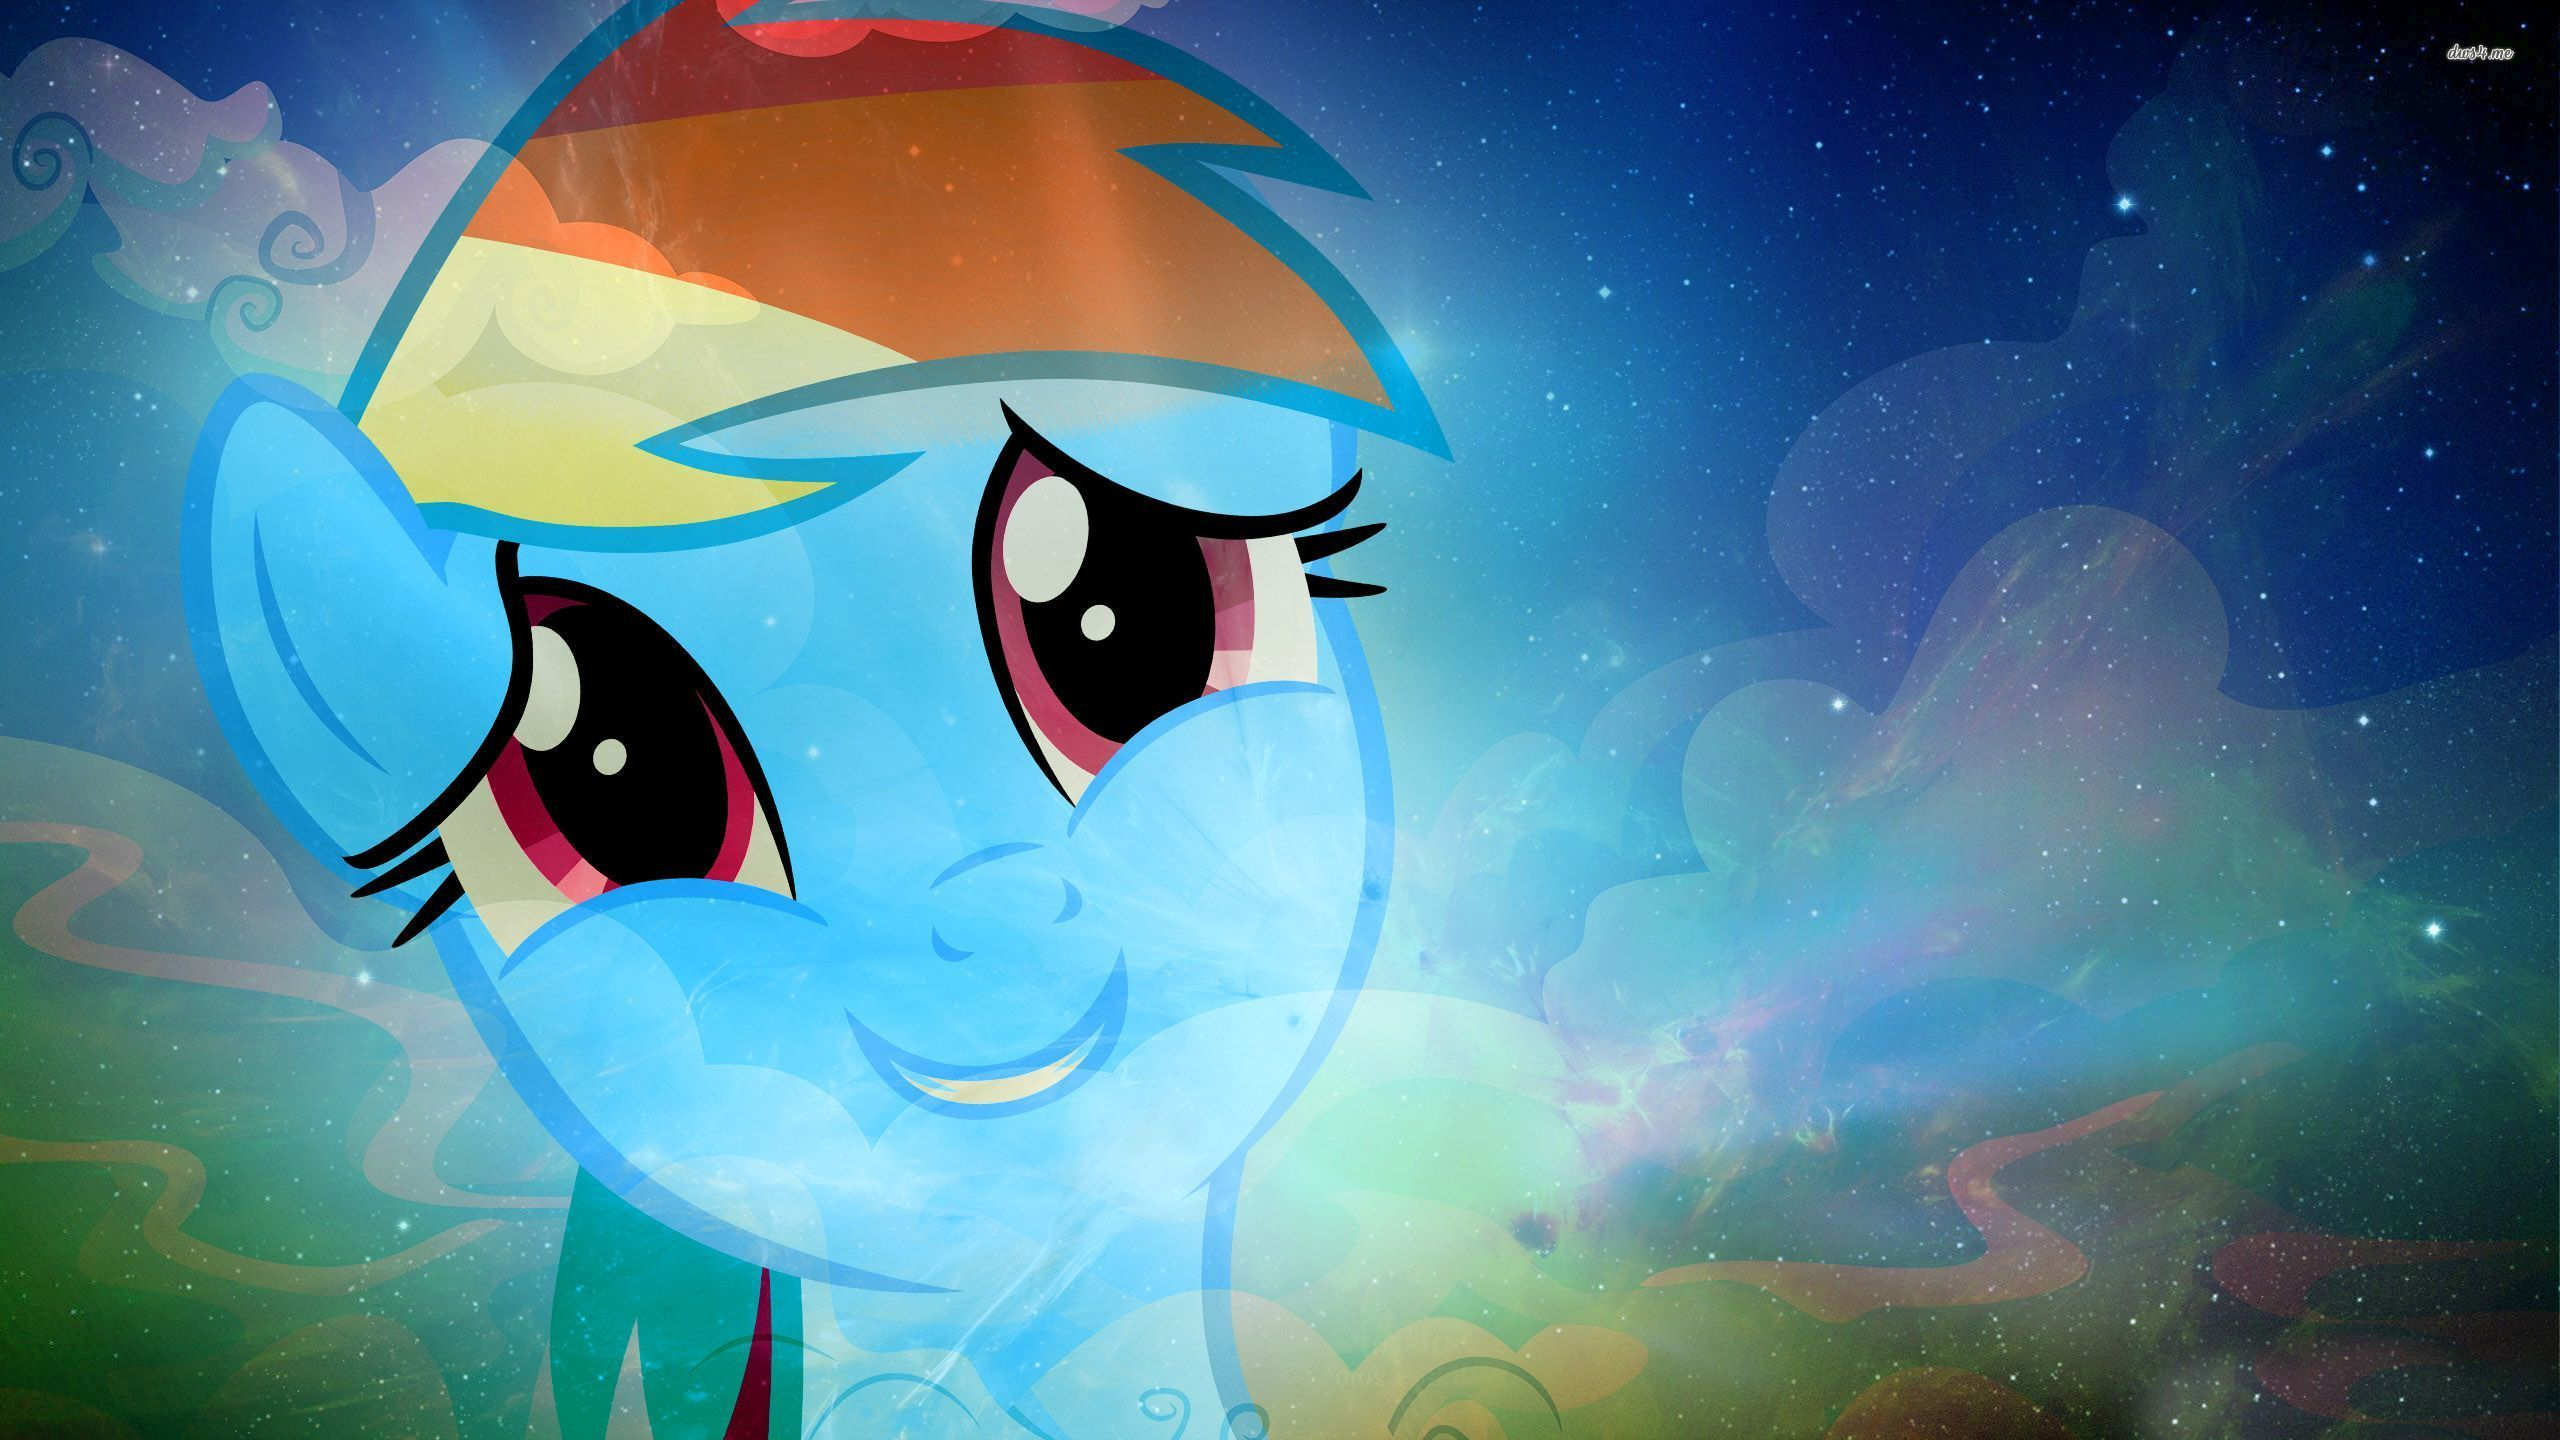 Rainbow Dash Blushing In My Little Pony Wallpaper Rainbow Dash